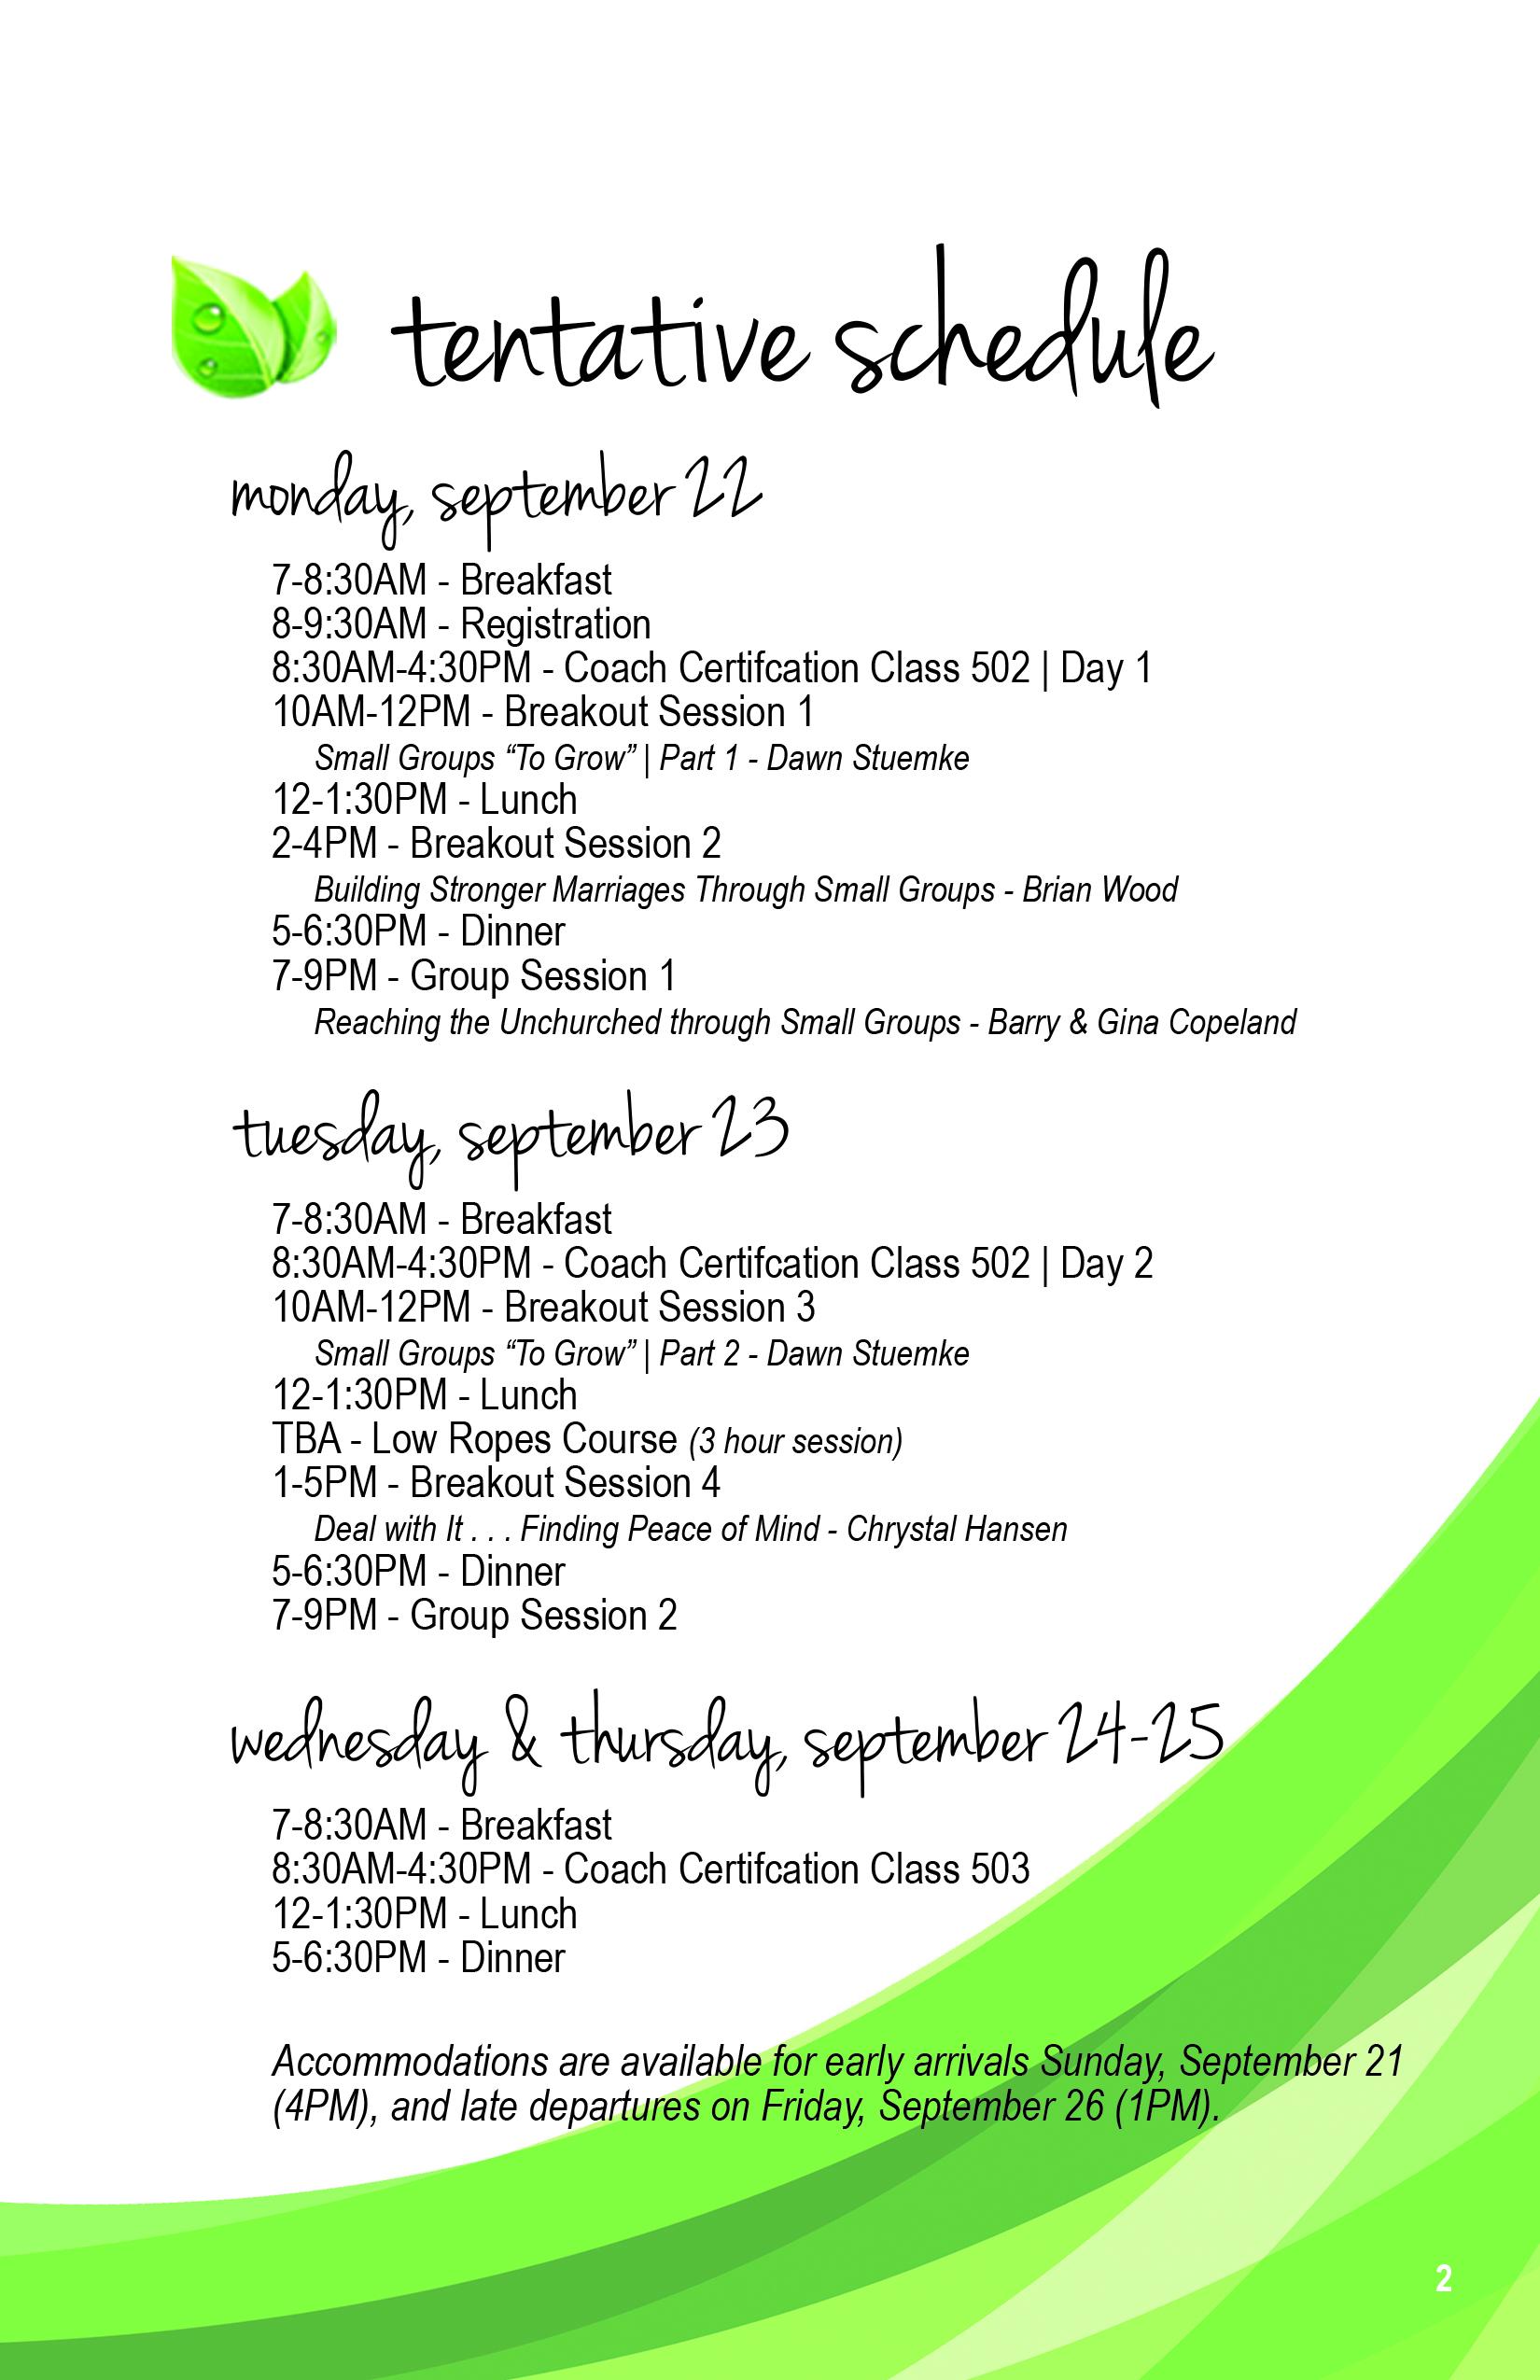 Tentative Conference Schedule